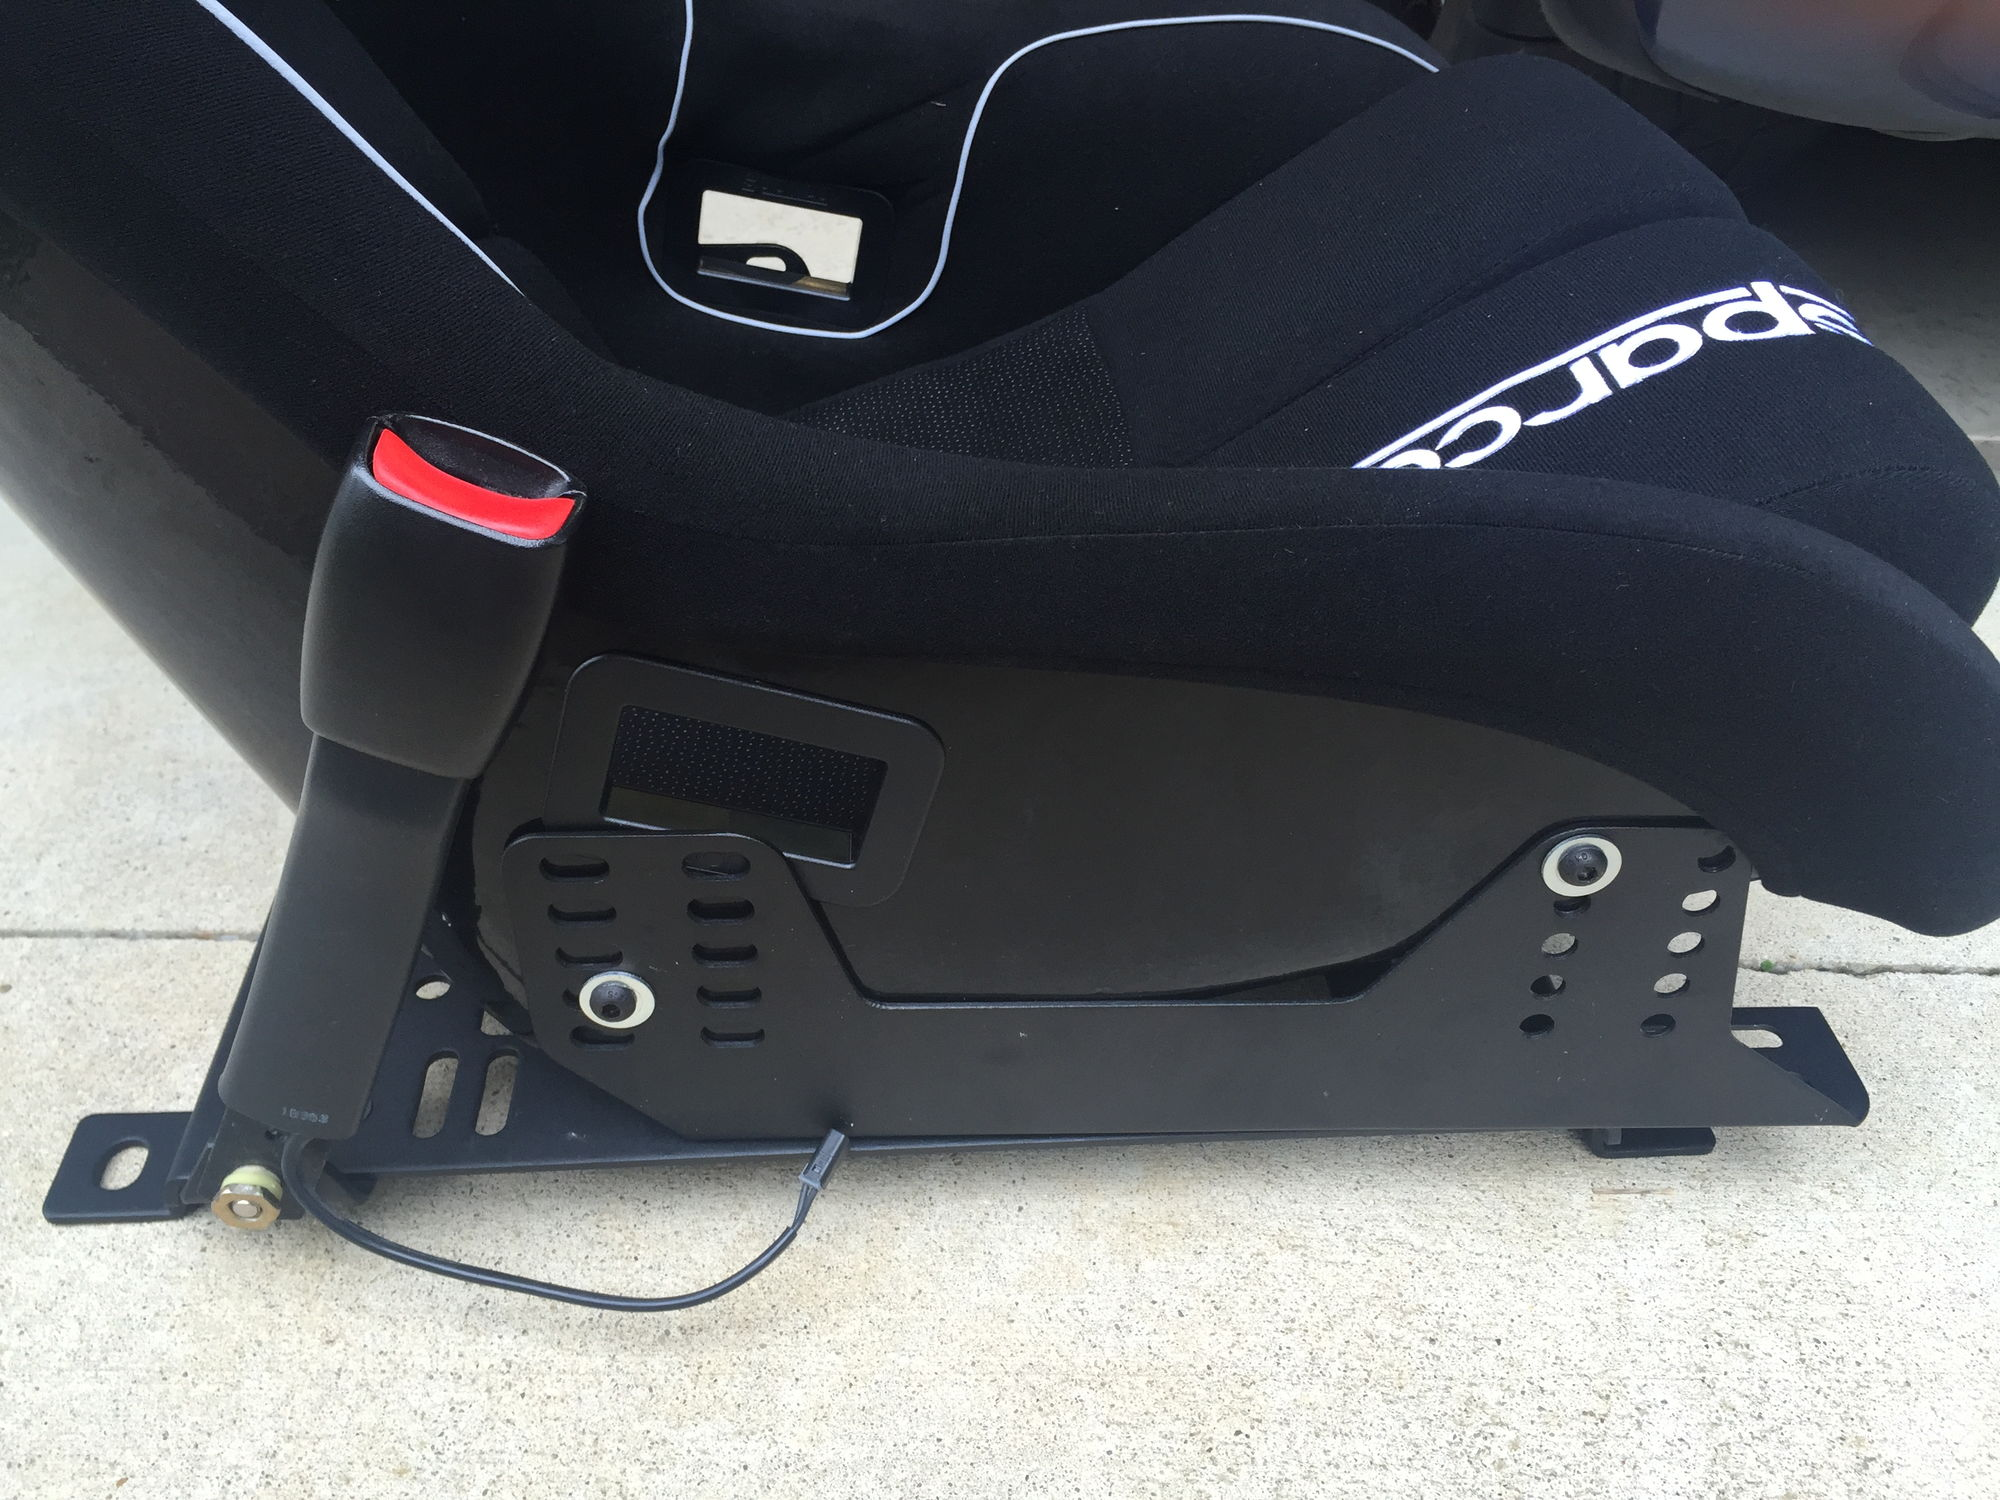 corvette seat office chair timothy oulton mimi sparco evo ii us install piece of cake corvetteforum